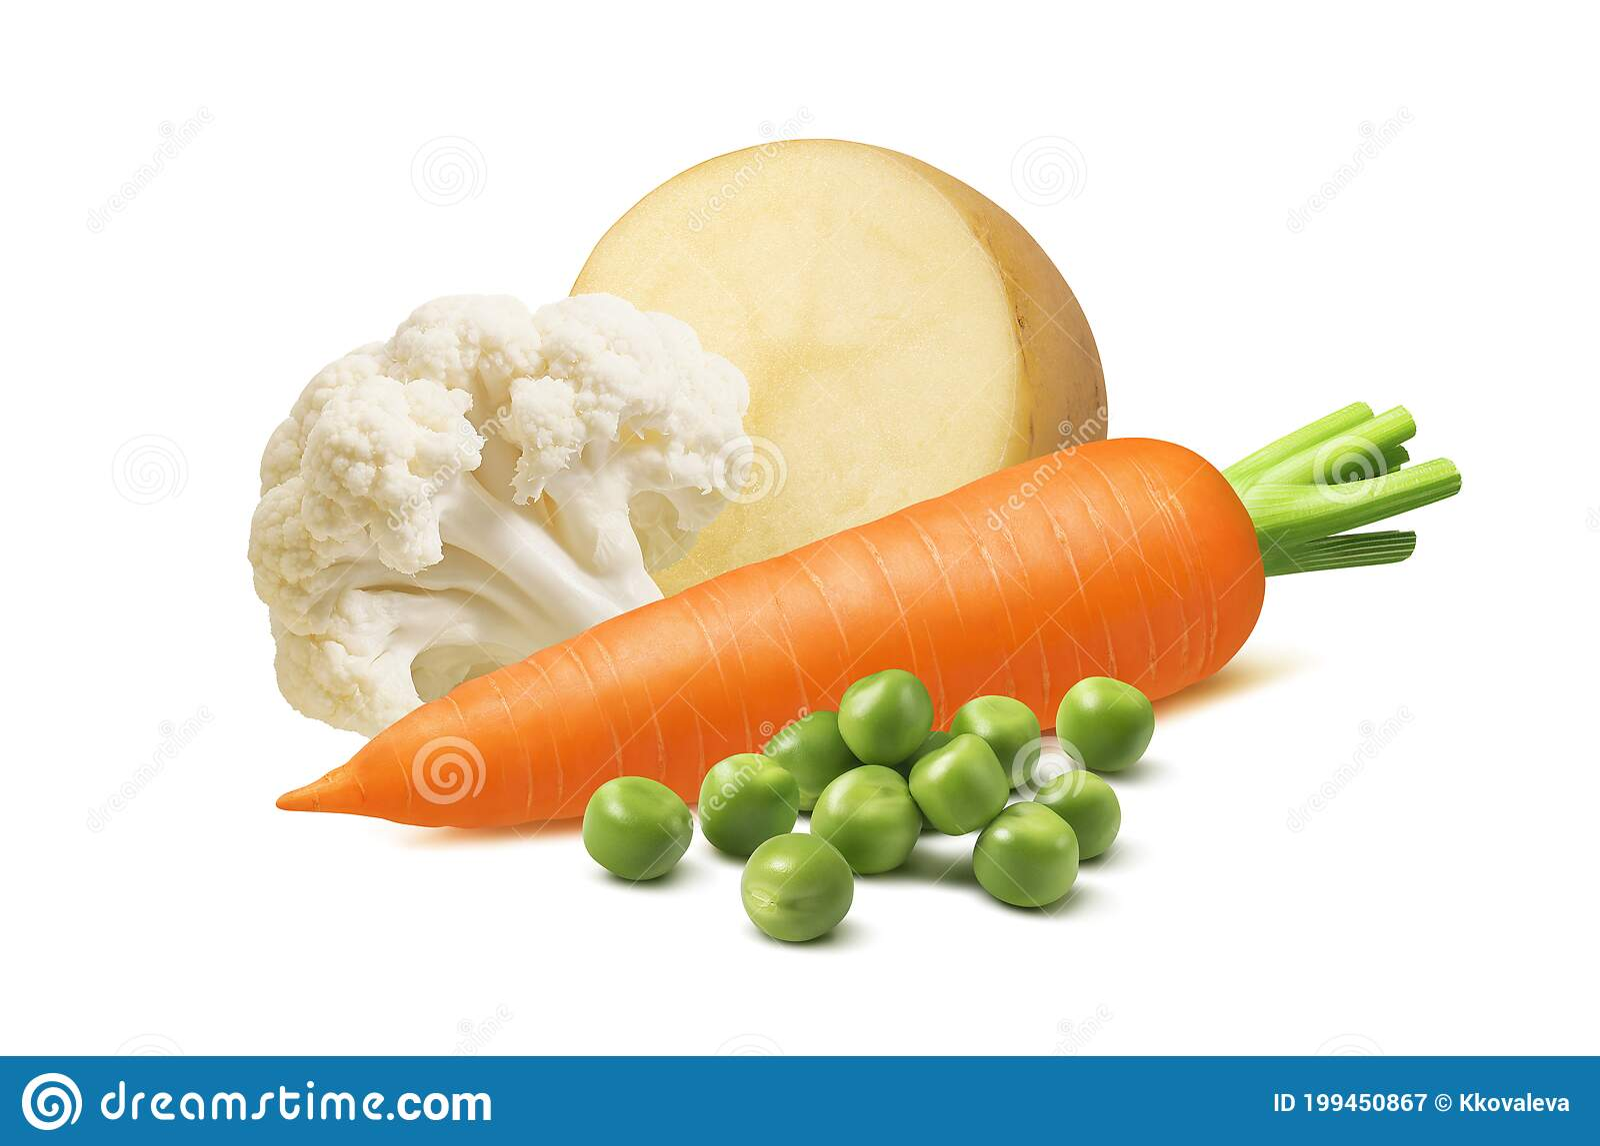 Cauliflower, Carrot, Potato and Green Peas Isolated on White ...